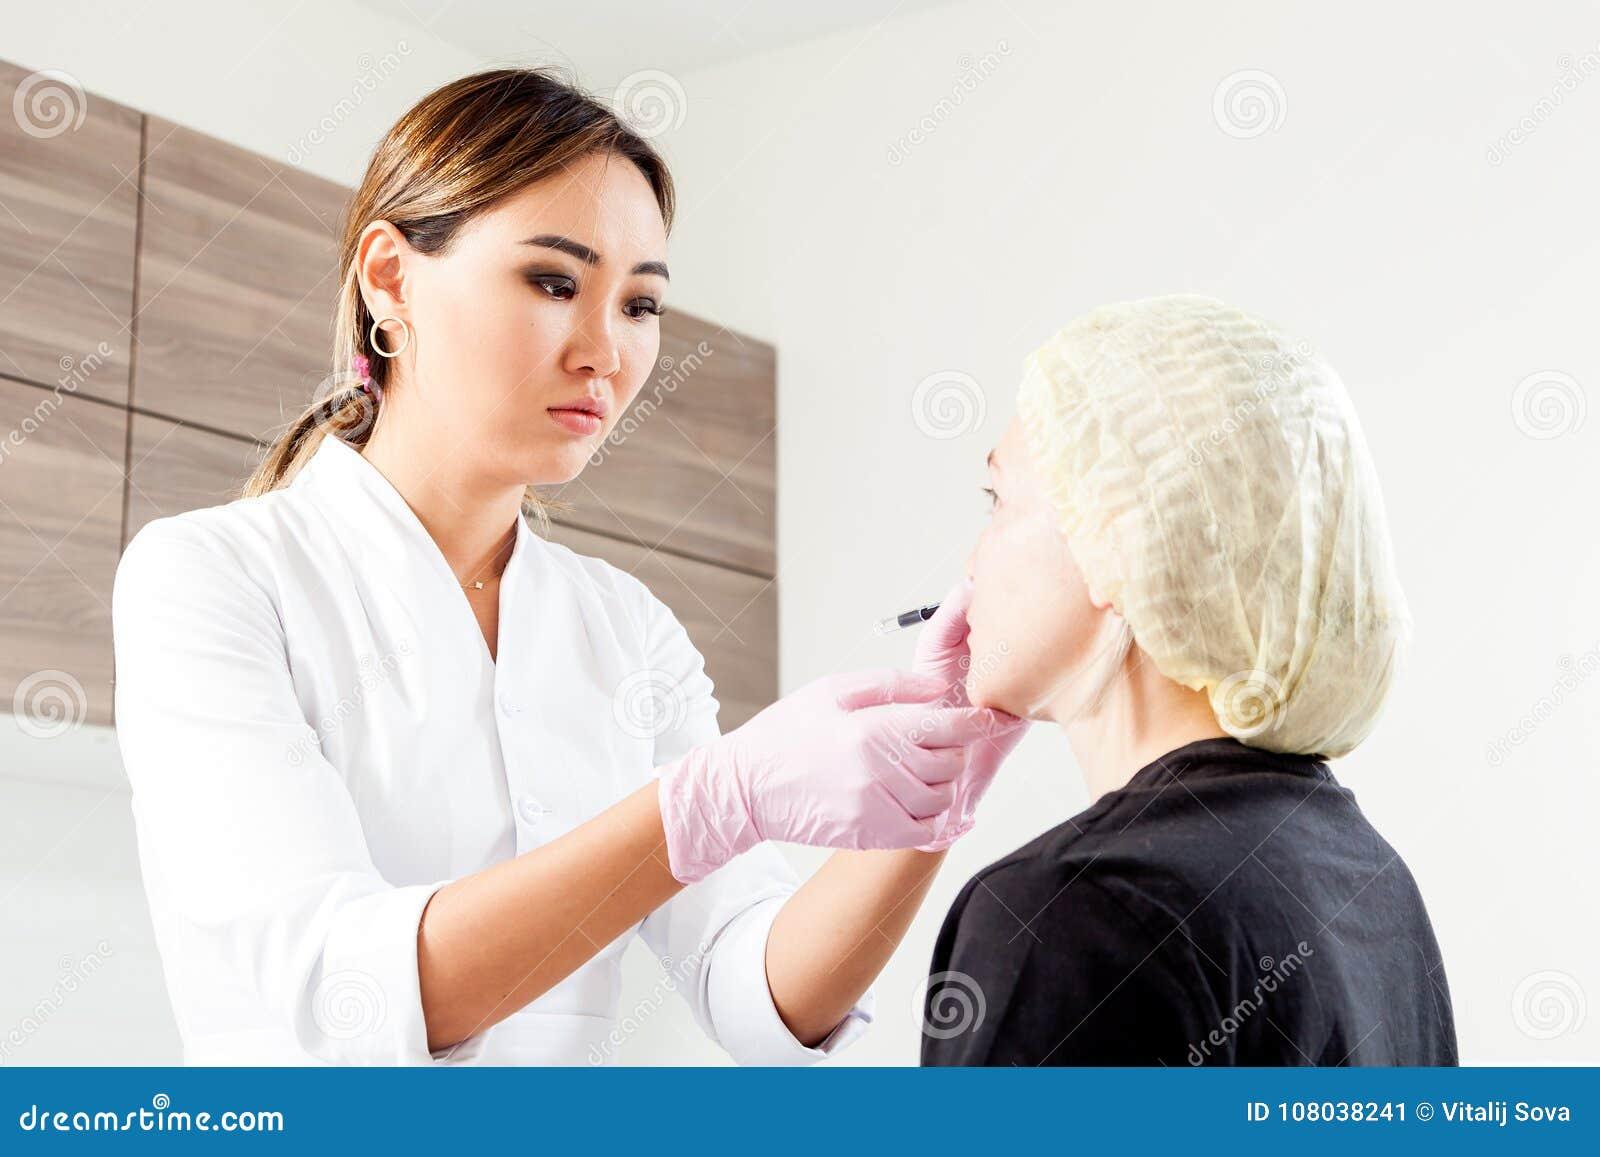 Beautician Pushes A Syringe To Inject Botox Stock Image - Image of